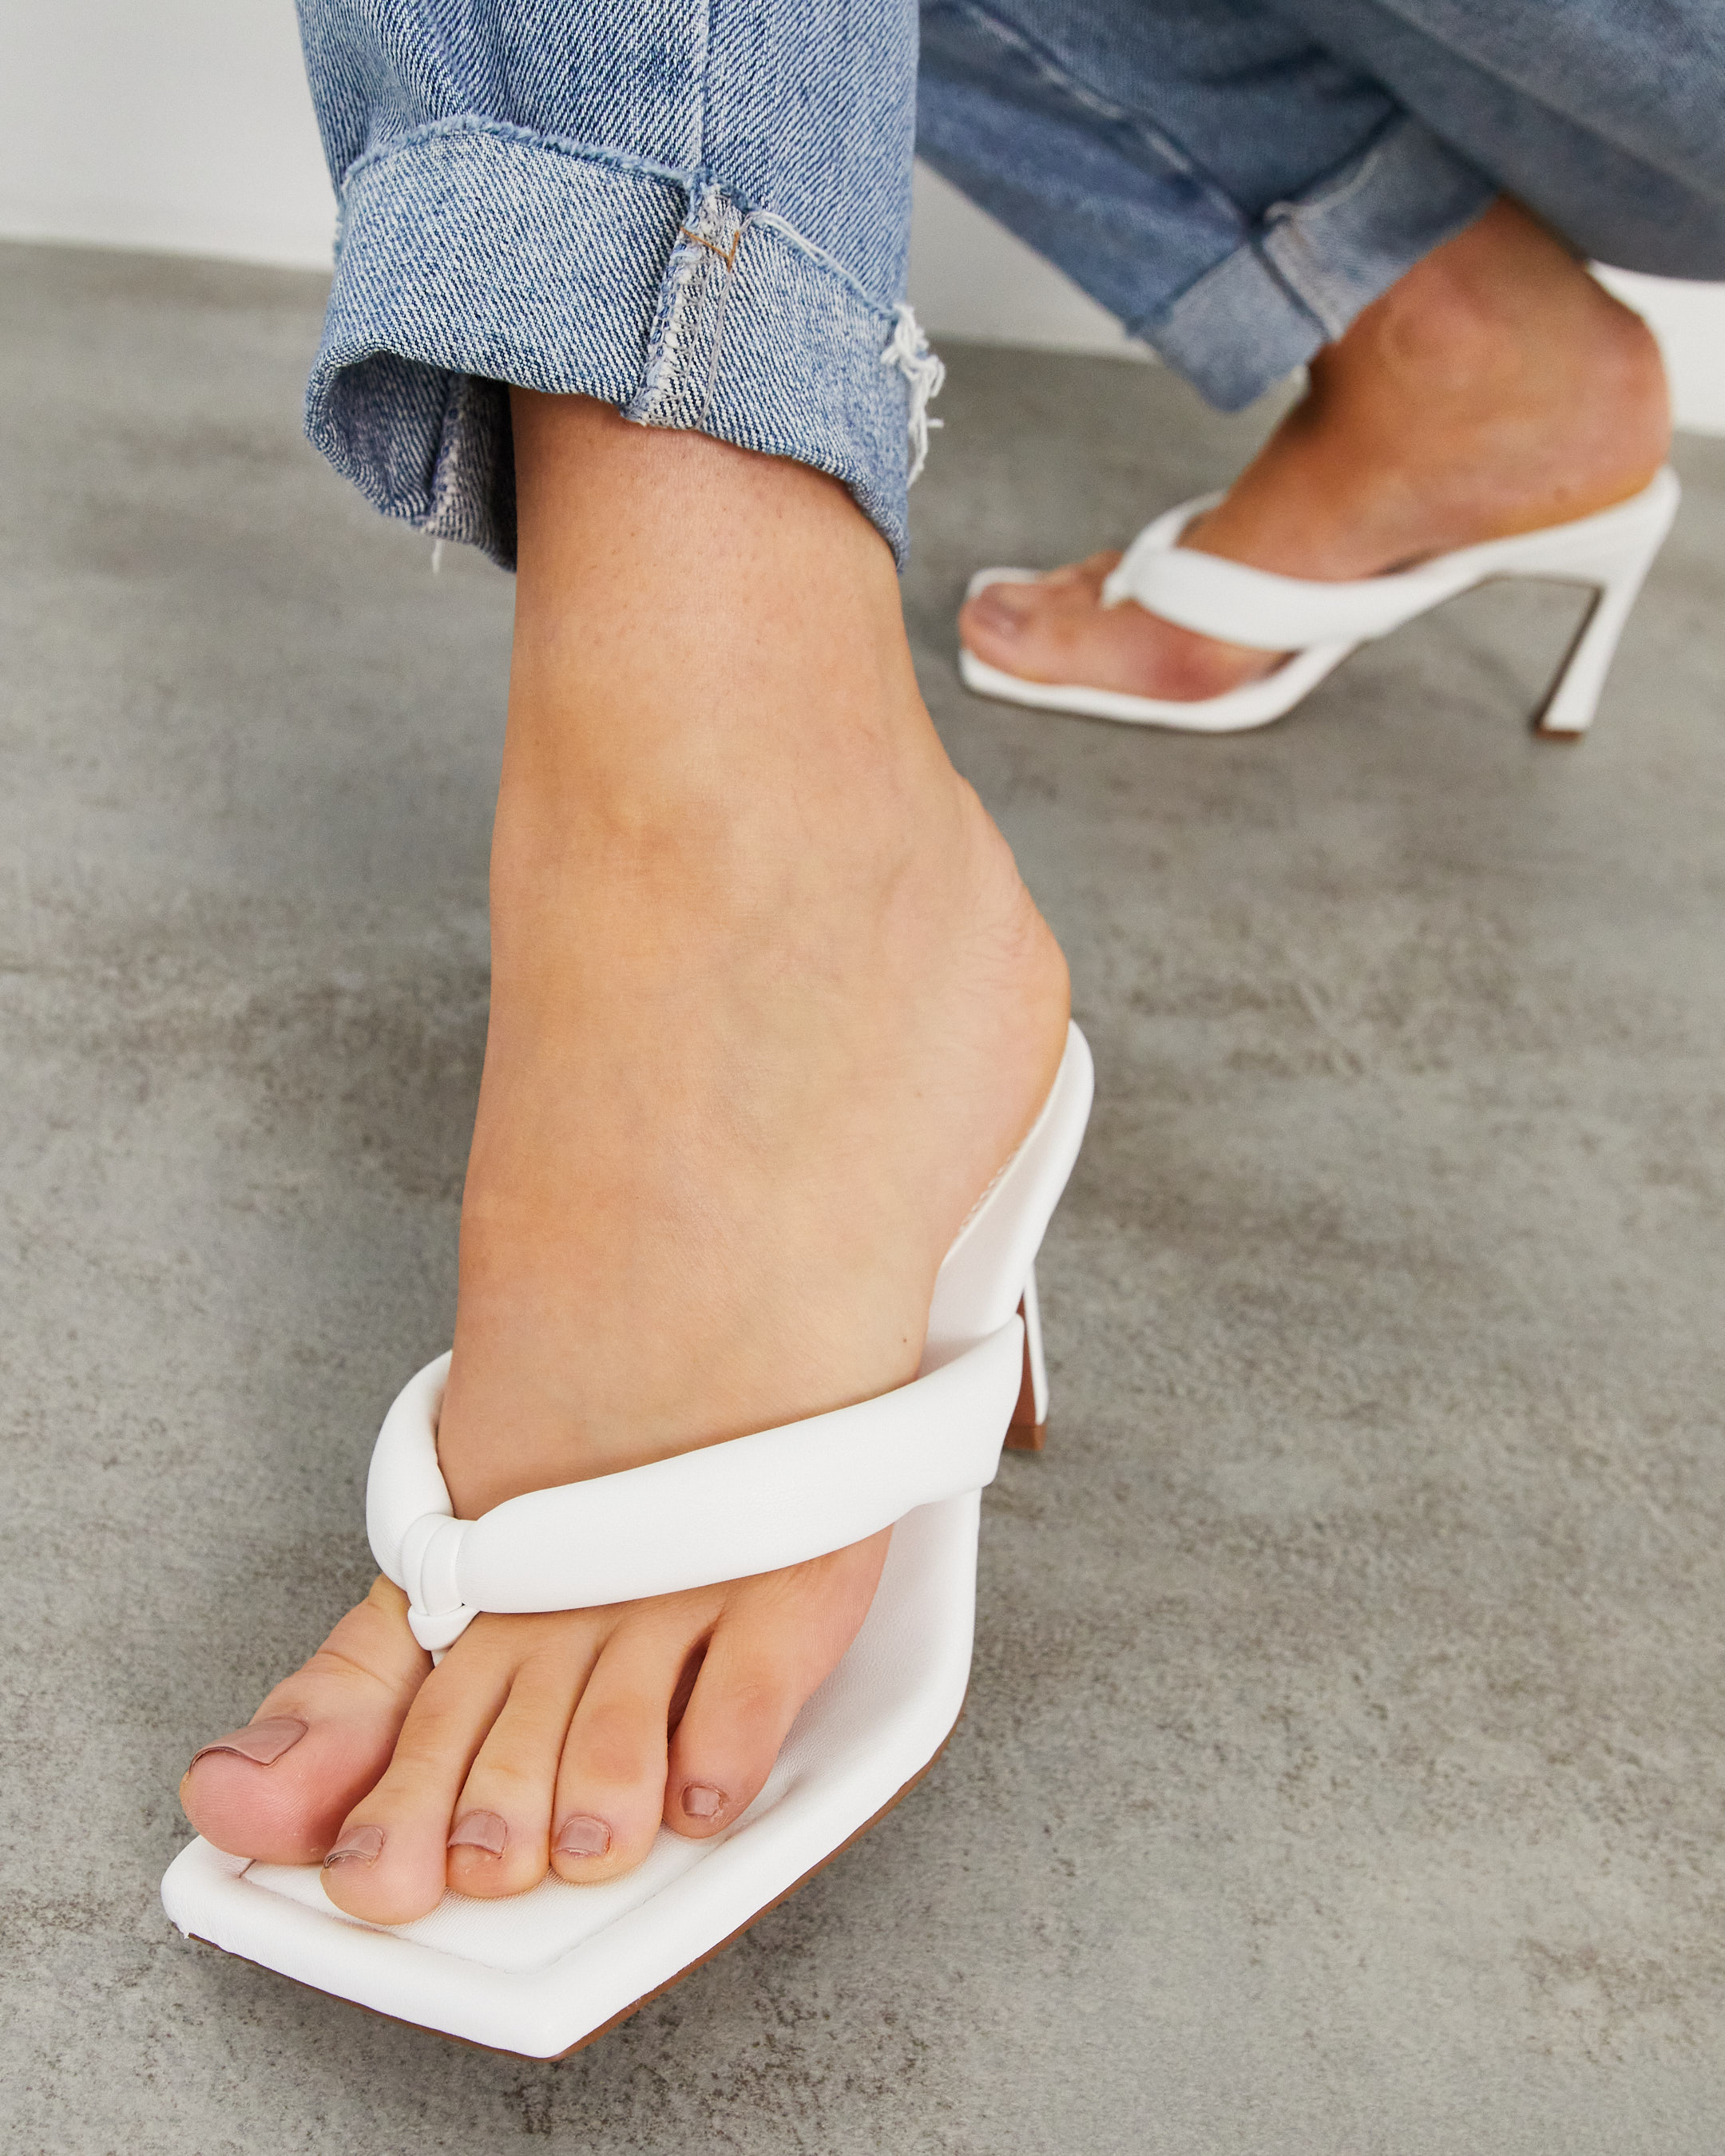 Sandalias de tacón blancas con tira para el dedo acolchada